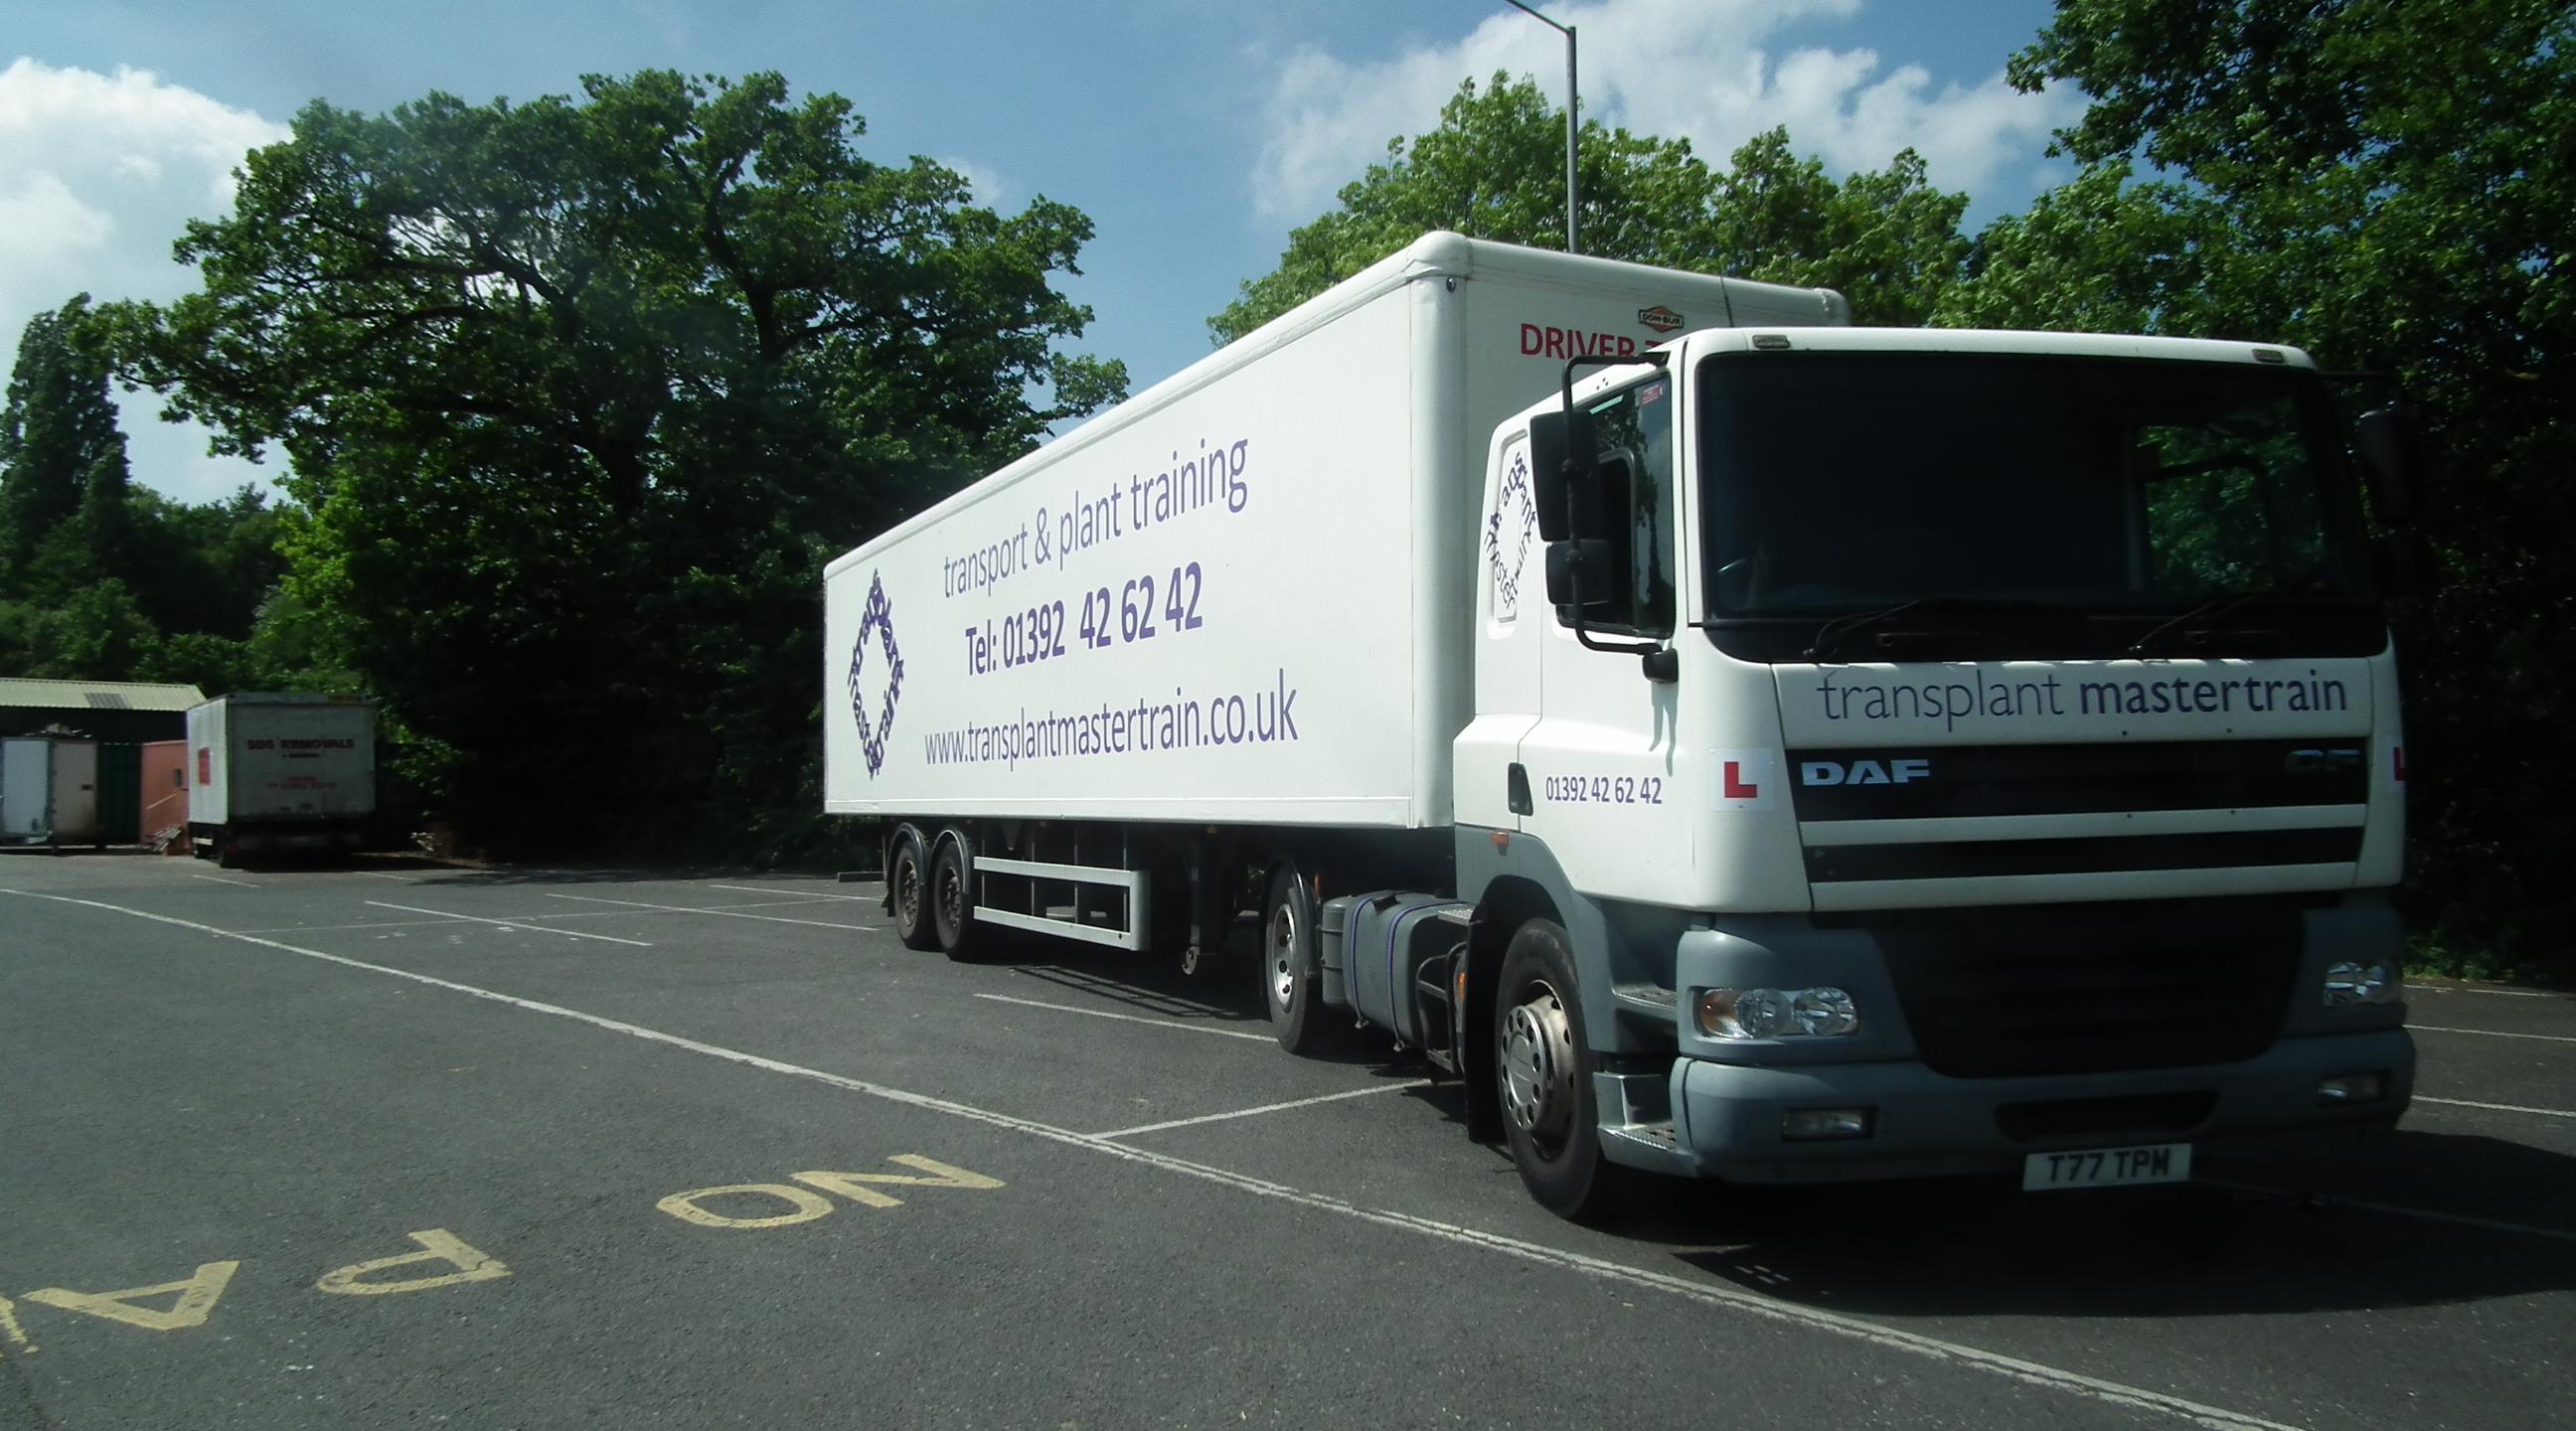 LGV / HGV Lorry Driver Training - Honiton quote